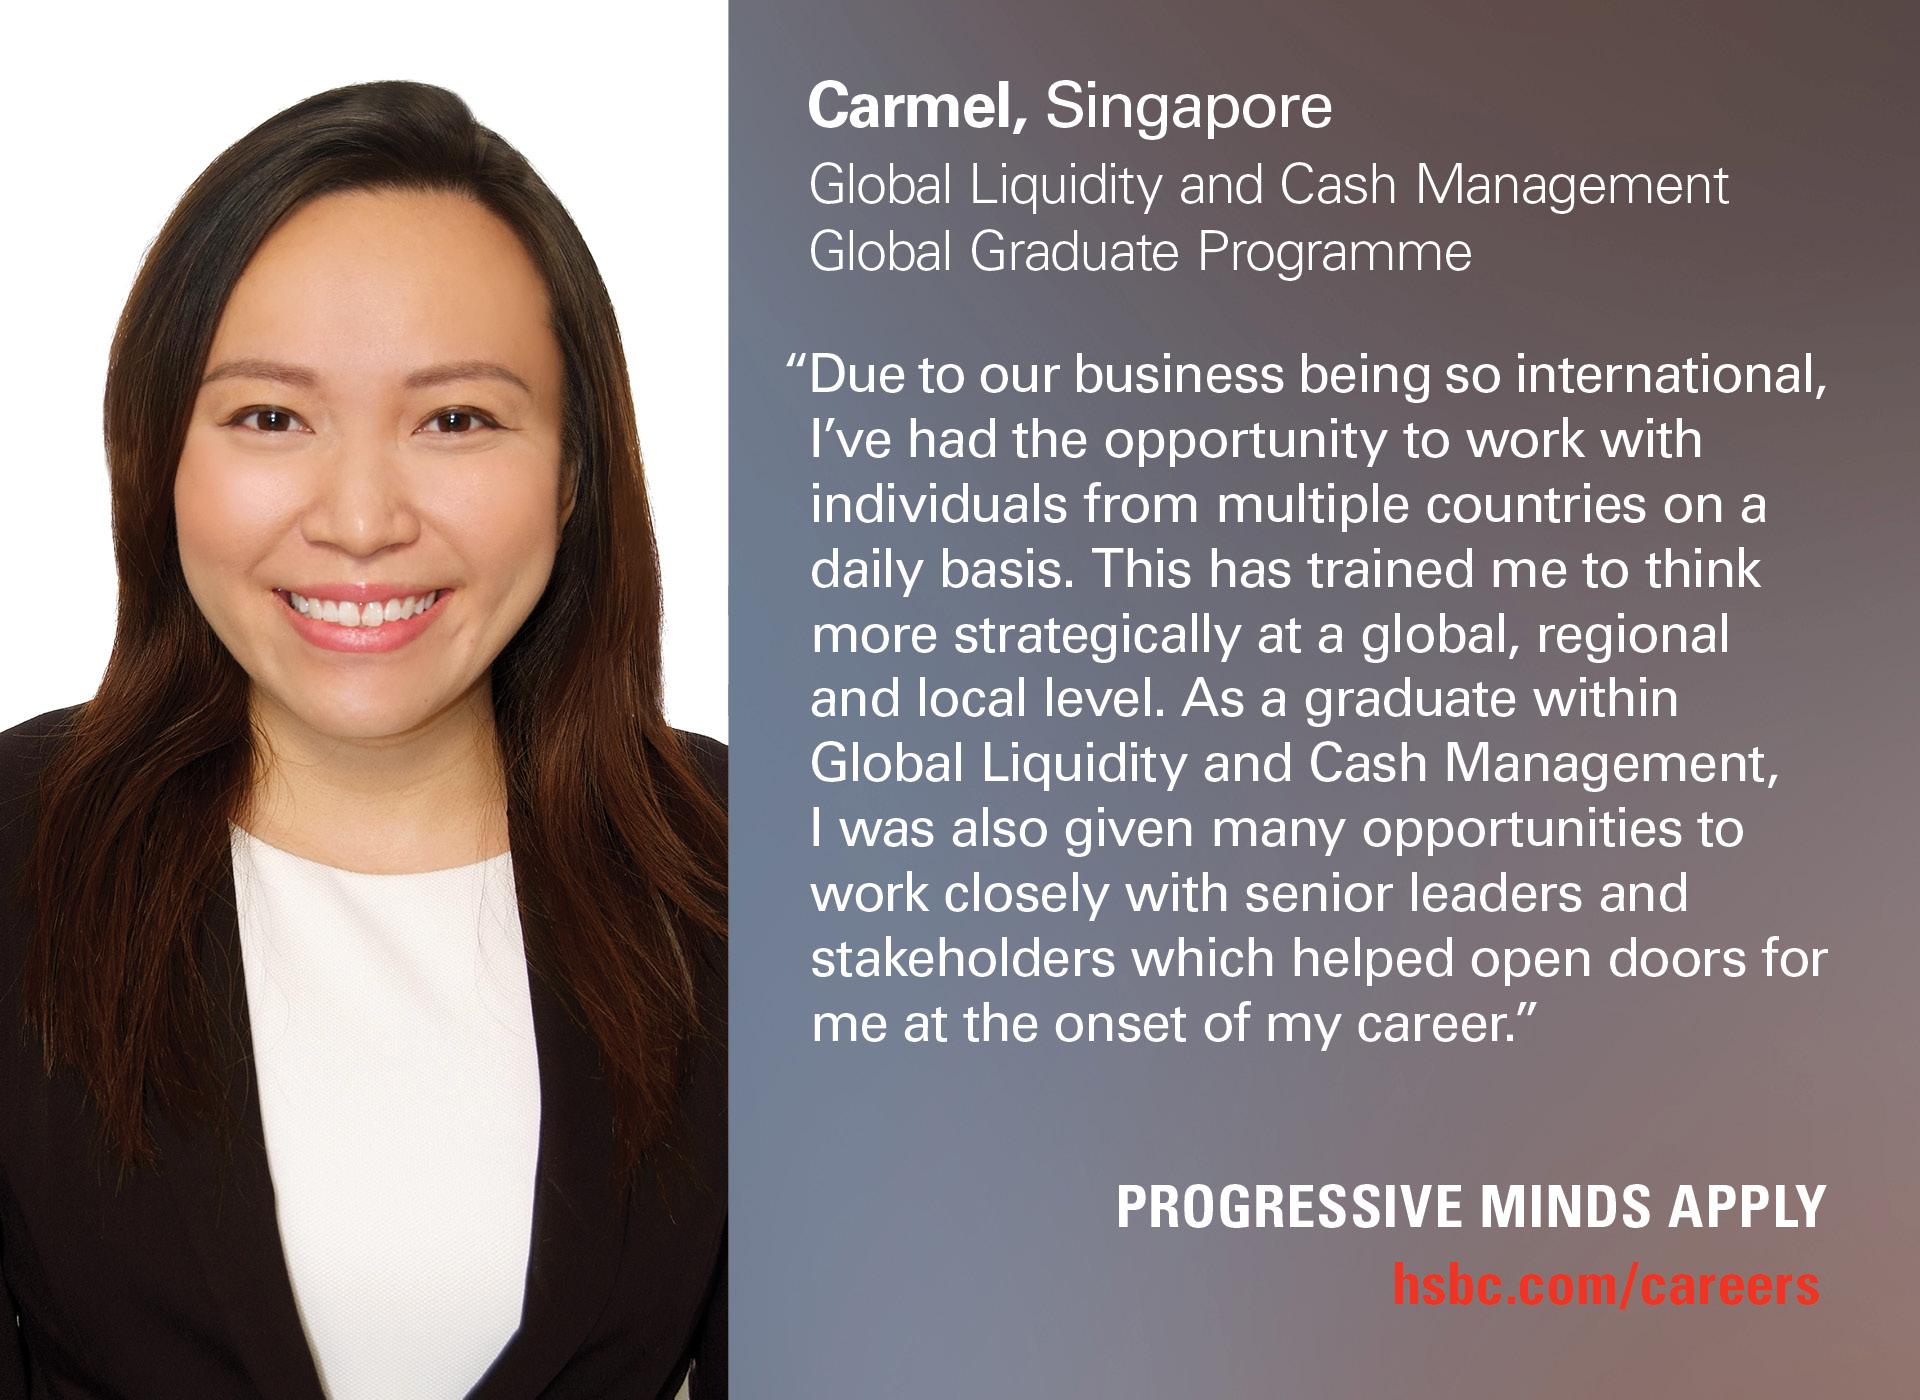 HSBC - Meet our 2017 Global Graduates